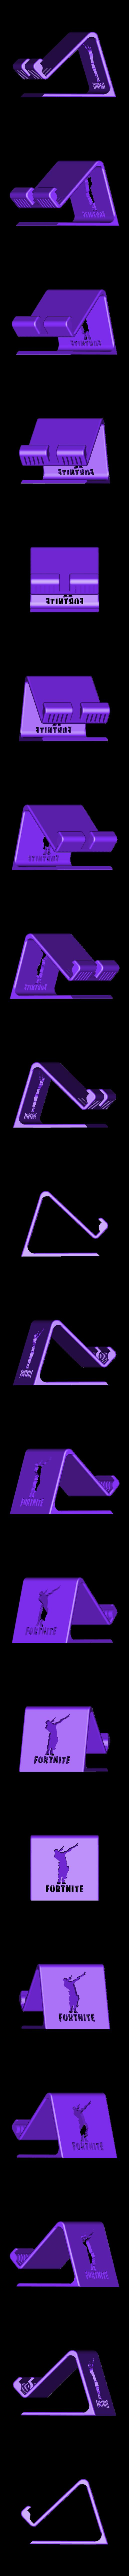 PhoneHolderFortniteDAB.stl Download STL file Phone Holder Phone stand Fortnite-DAB • 3D printer template, ludovic_gauthier